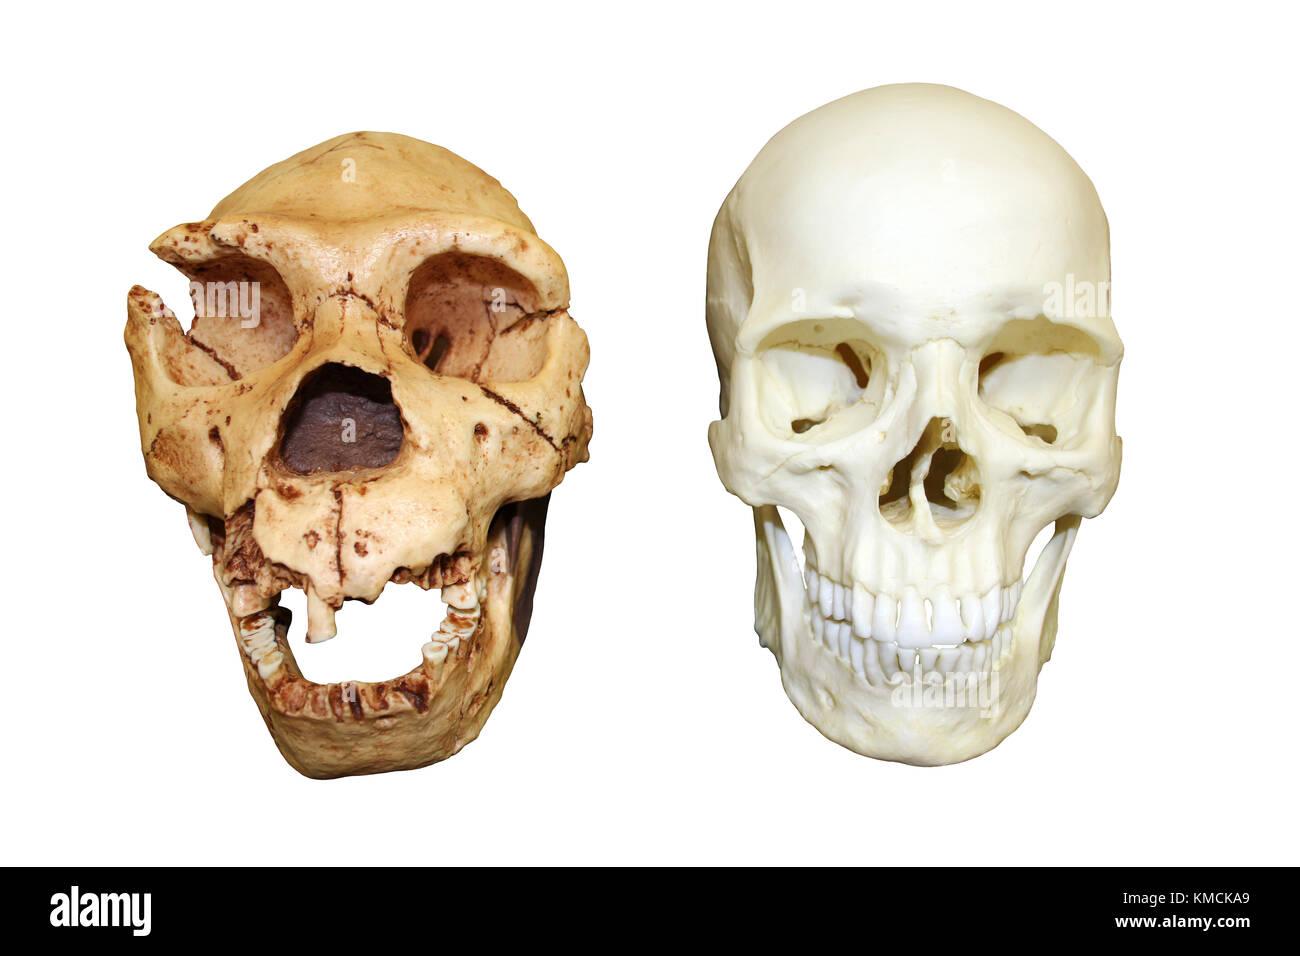 Homo heidelbergensis vs Homo sapiens skull - Stock Image